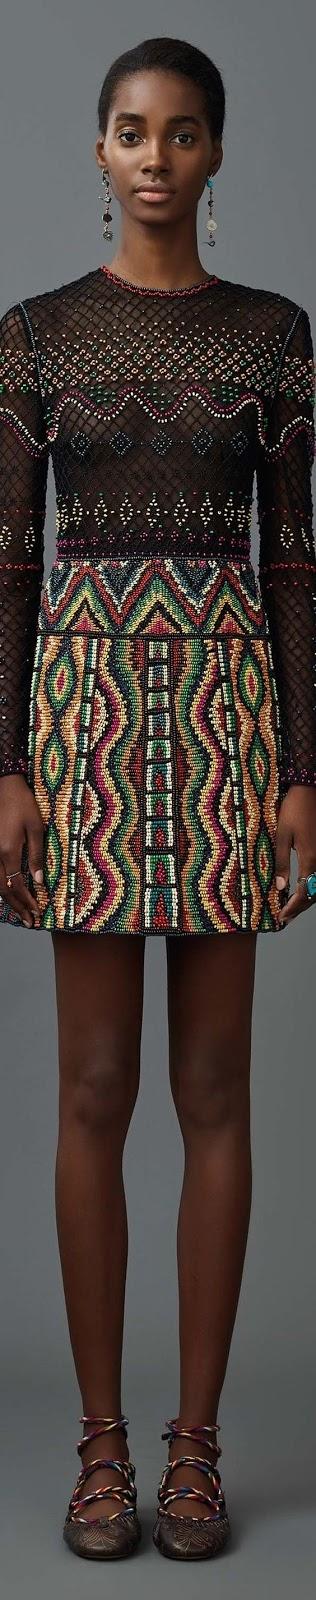 koralikowe hafty